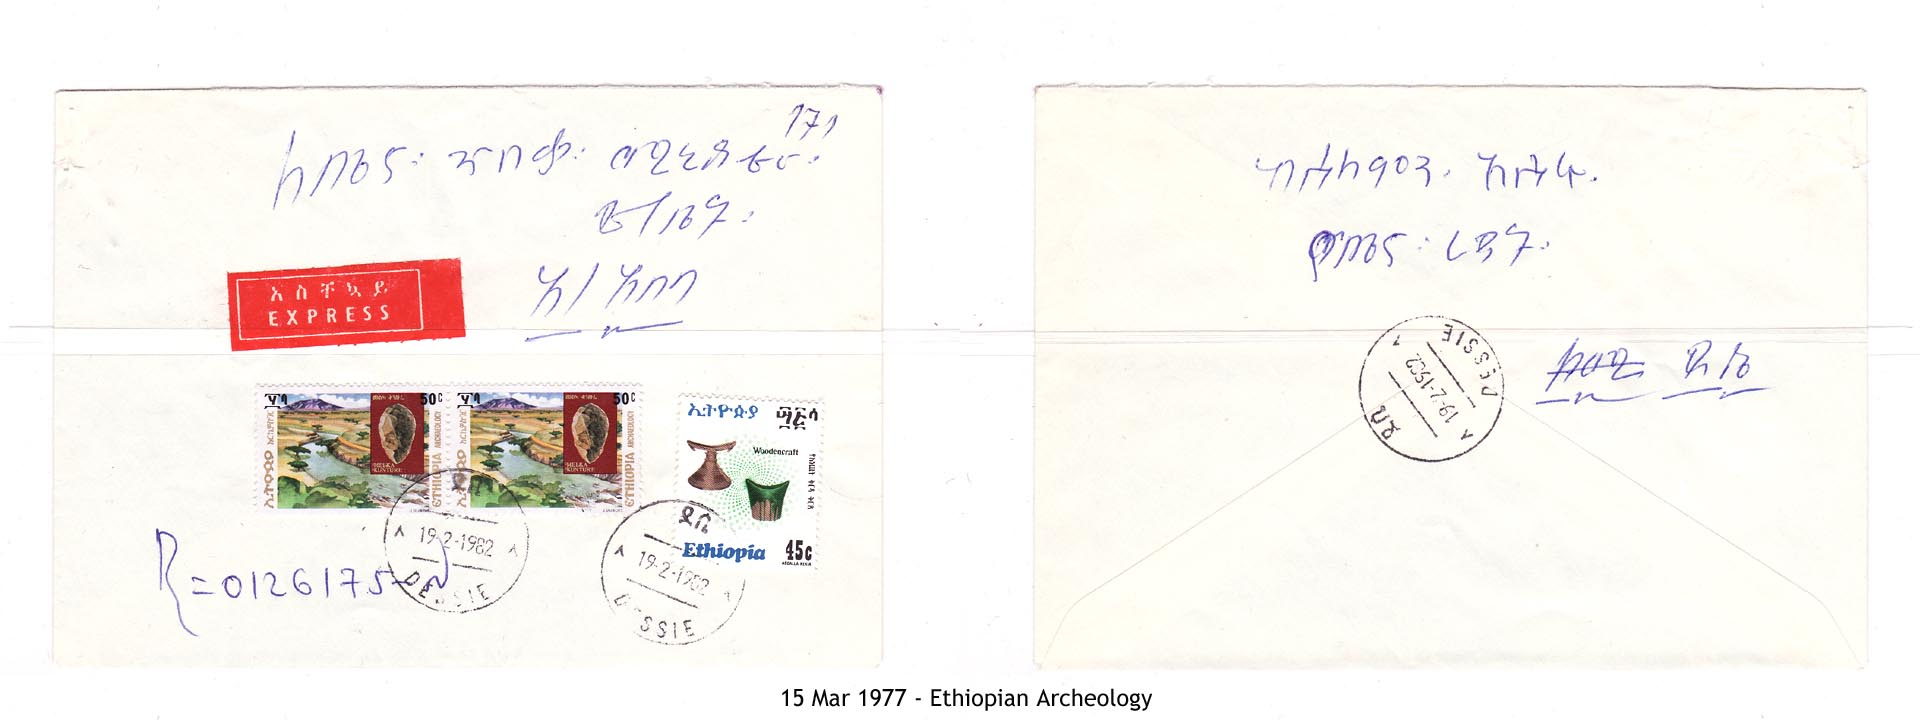 19770315 - Ethiopian Archeology